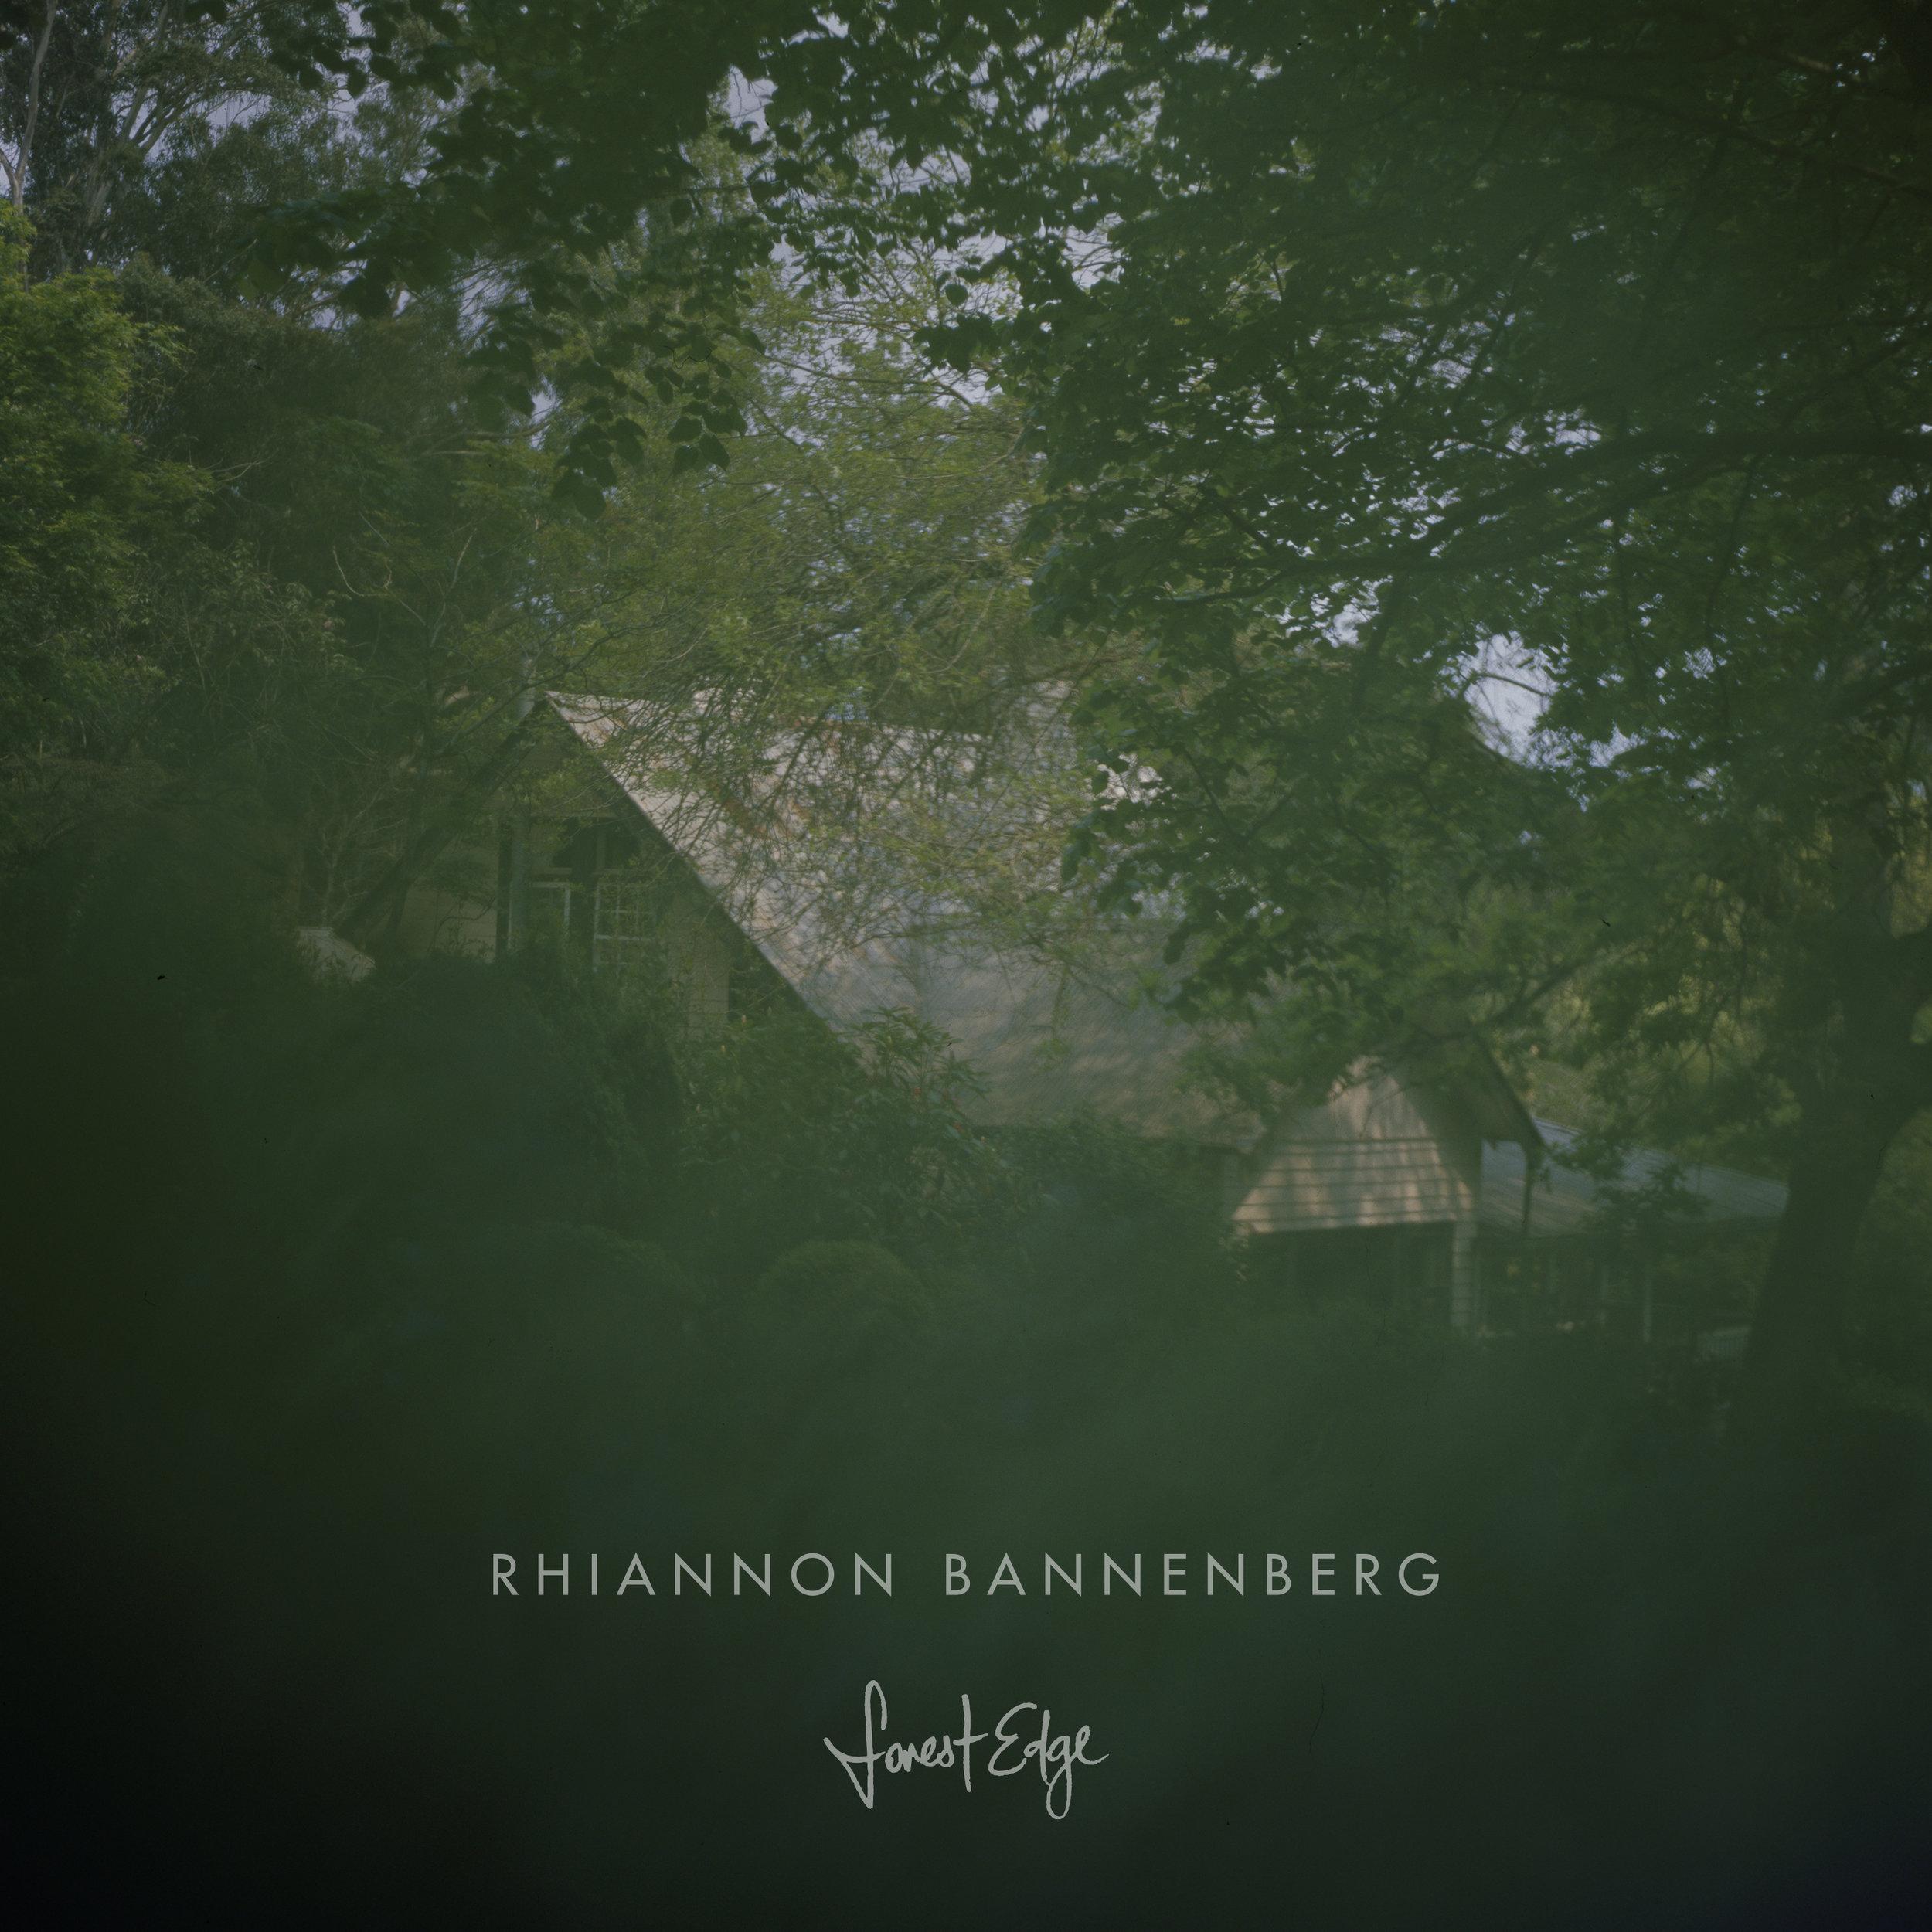 Rhiannon-Bannenberg-Forest-Edge-CD-Artwork-3000px-300dpi (1) copy.jpg